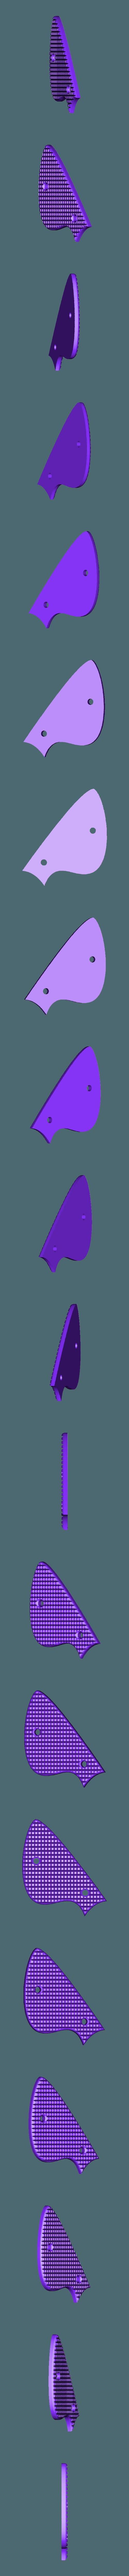 Grip_1.stl Download free STL file Raygun • 3D print template, cmoore1